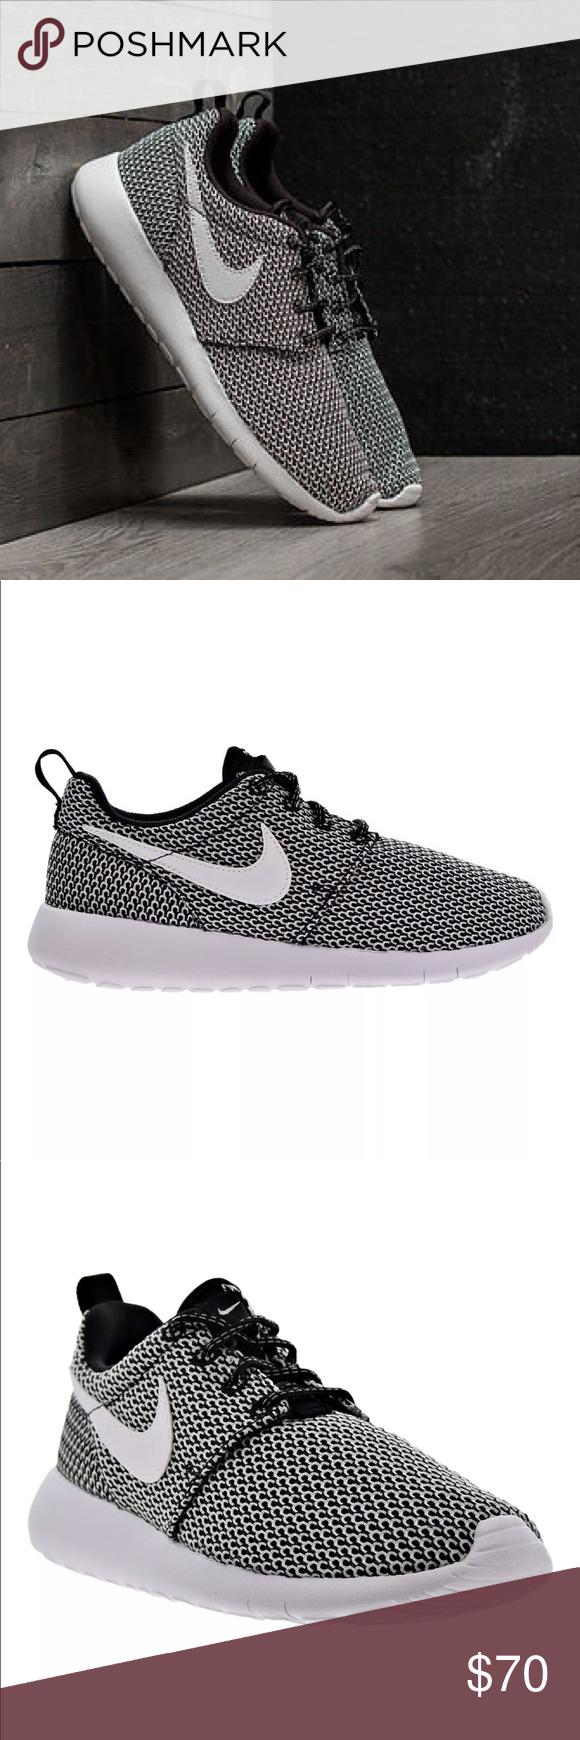 Sale Nike Roshe One Women S Black White Shoes Black And White Shoes White Shoes Shoes